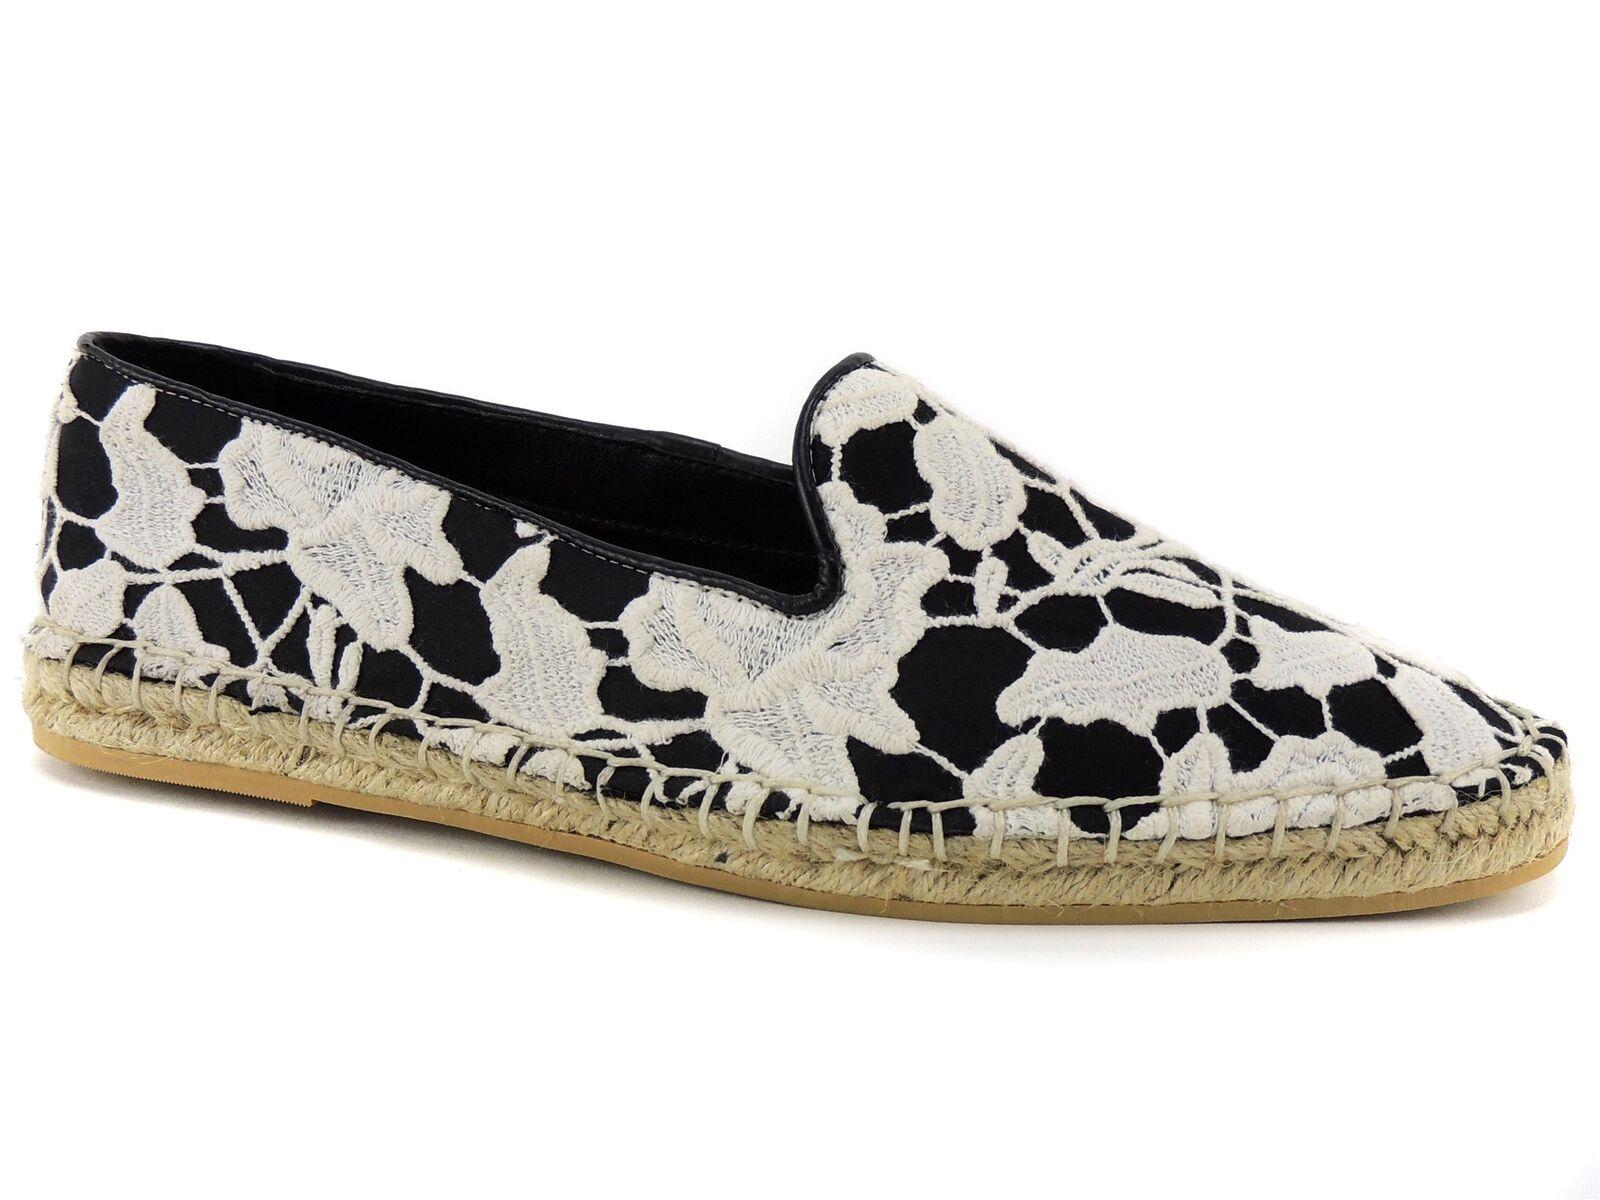 Cole Haan Women's Palmero Slip-On Espadrilles Loafers Black White Lace 8.5 M